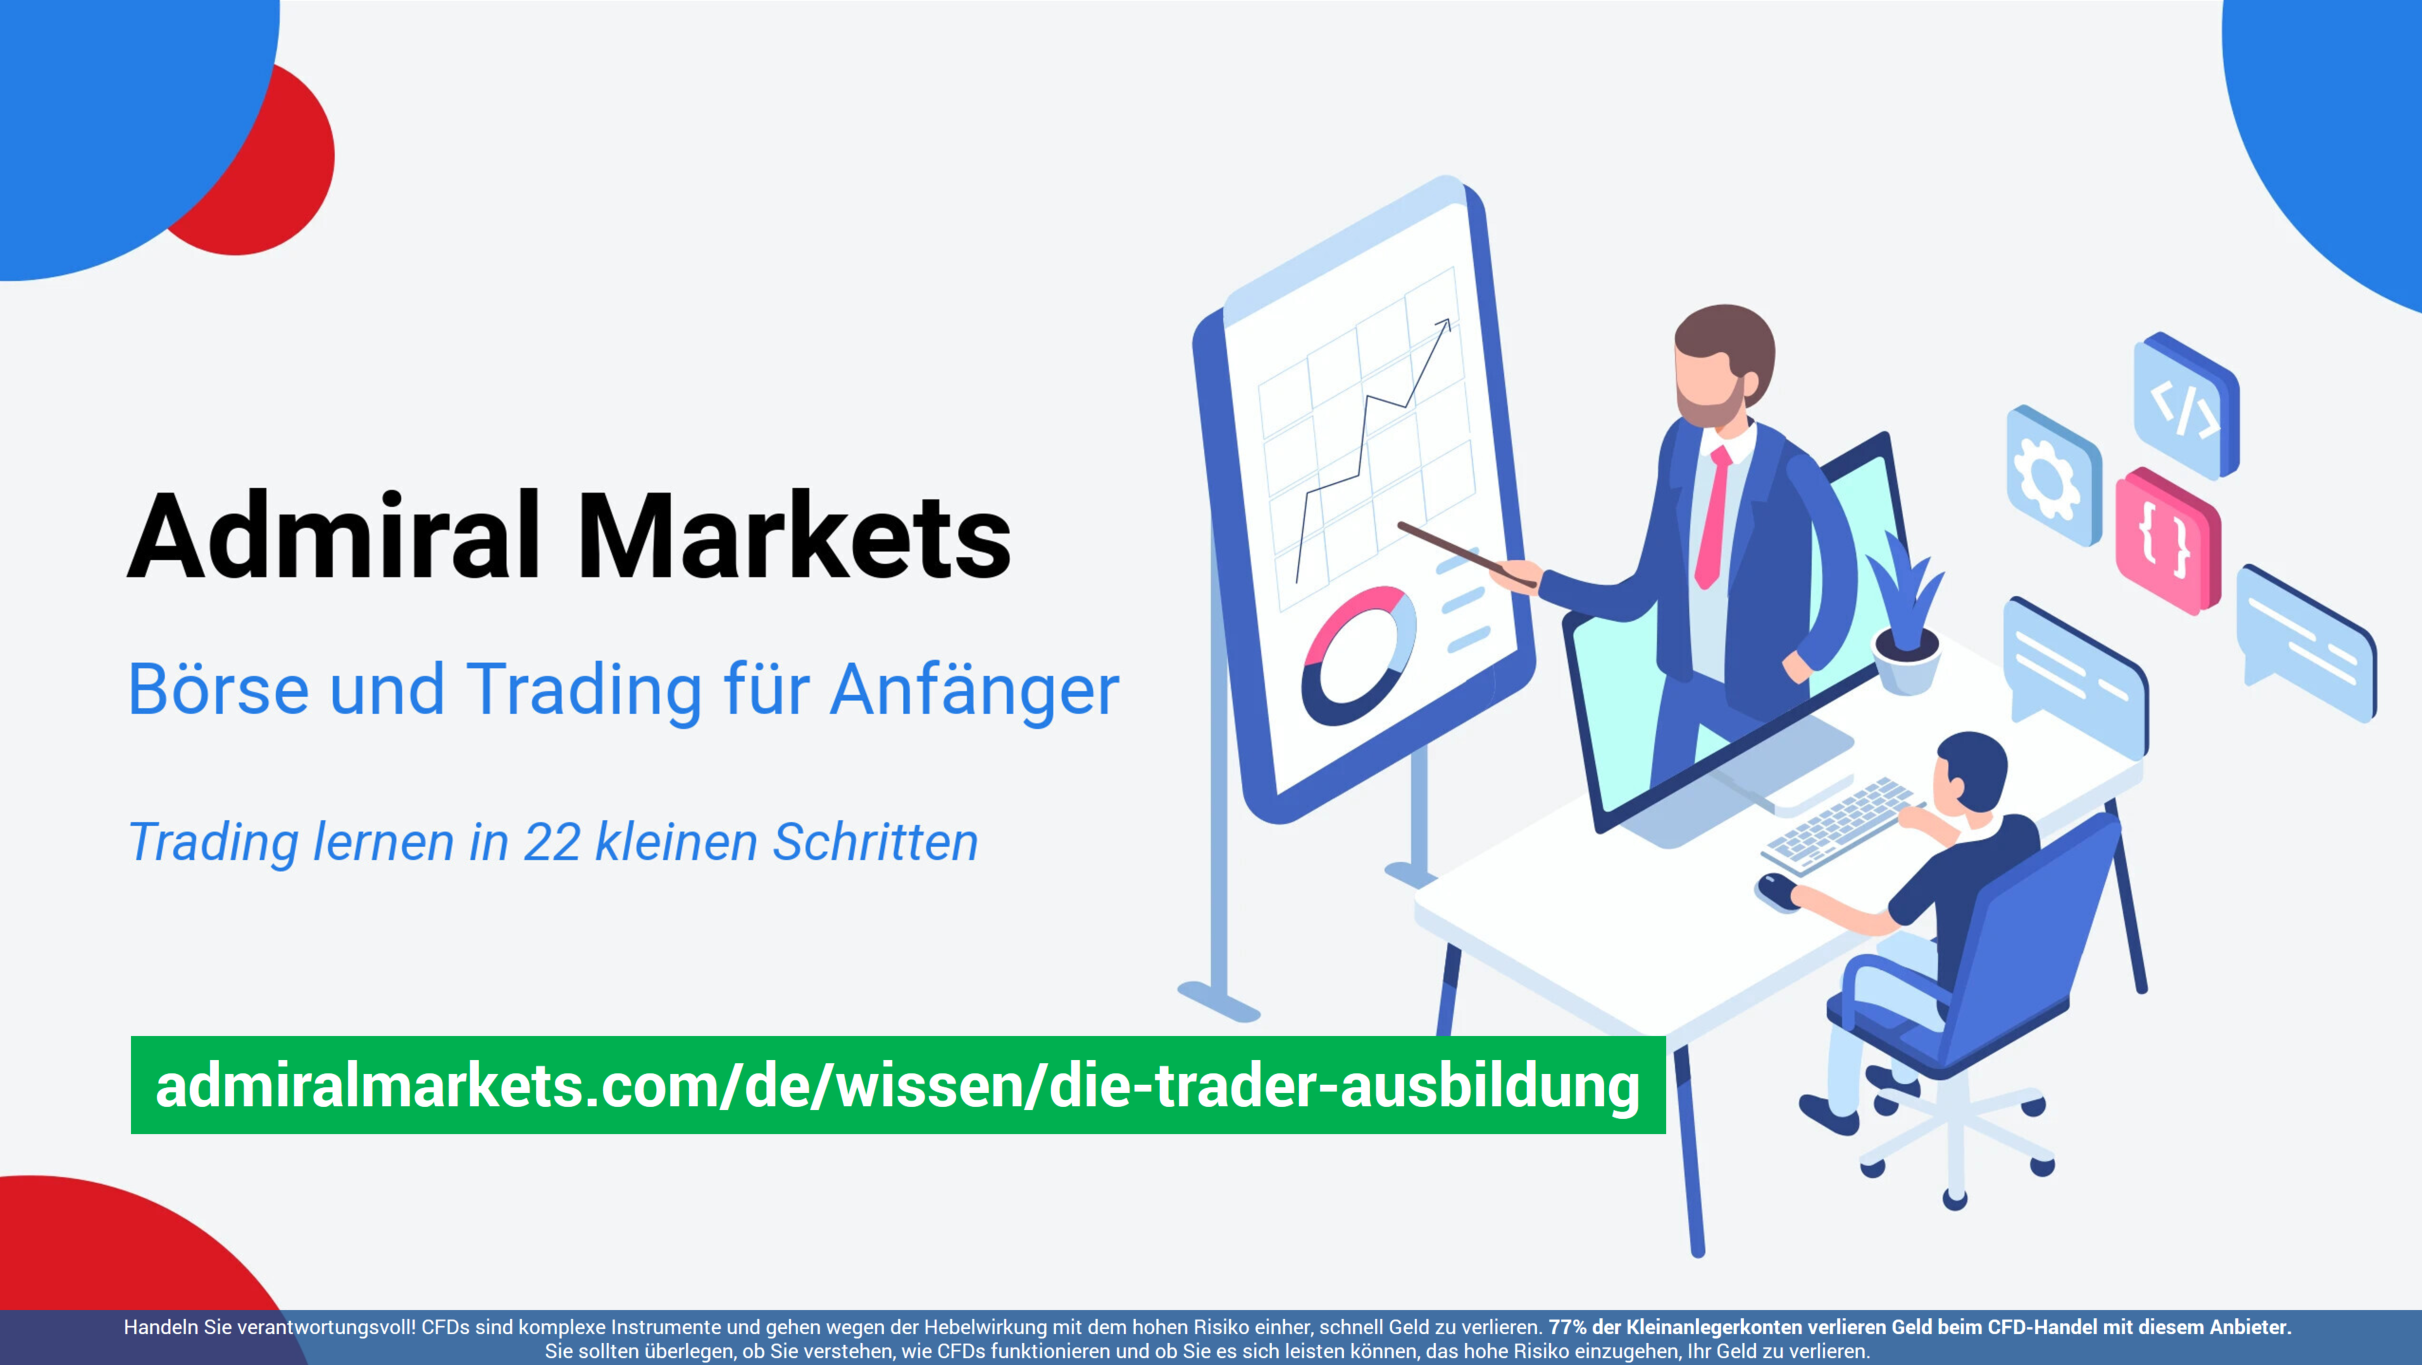 DAX-Analyse-Setups-Scalping-Tradingideen-26-02-2021-Guten-Morgen-DAX-Jens-Chrzanowski-GodmodeTrader.de-2